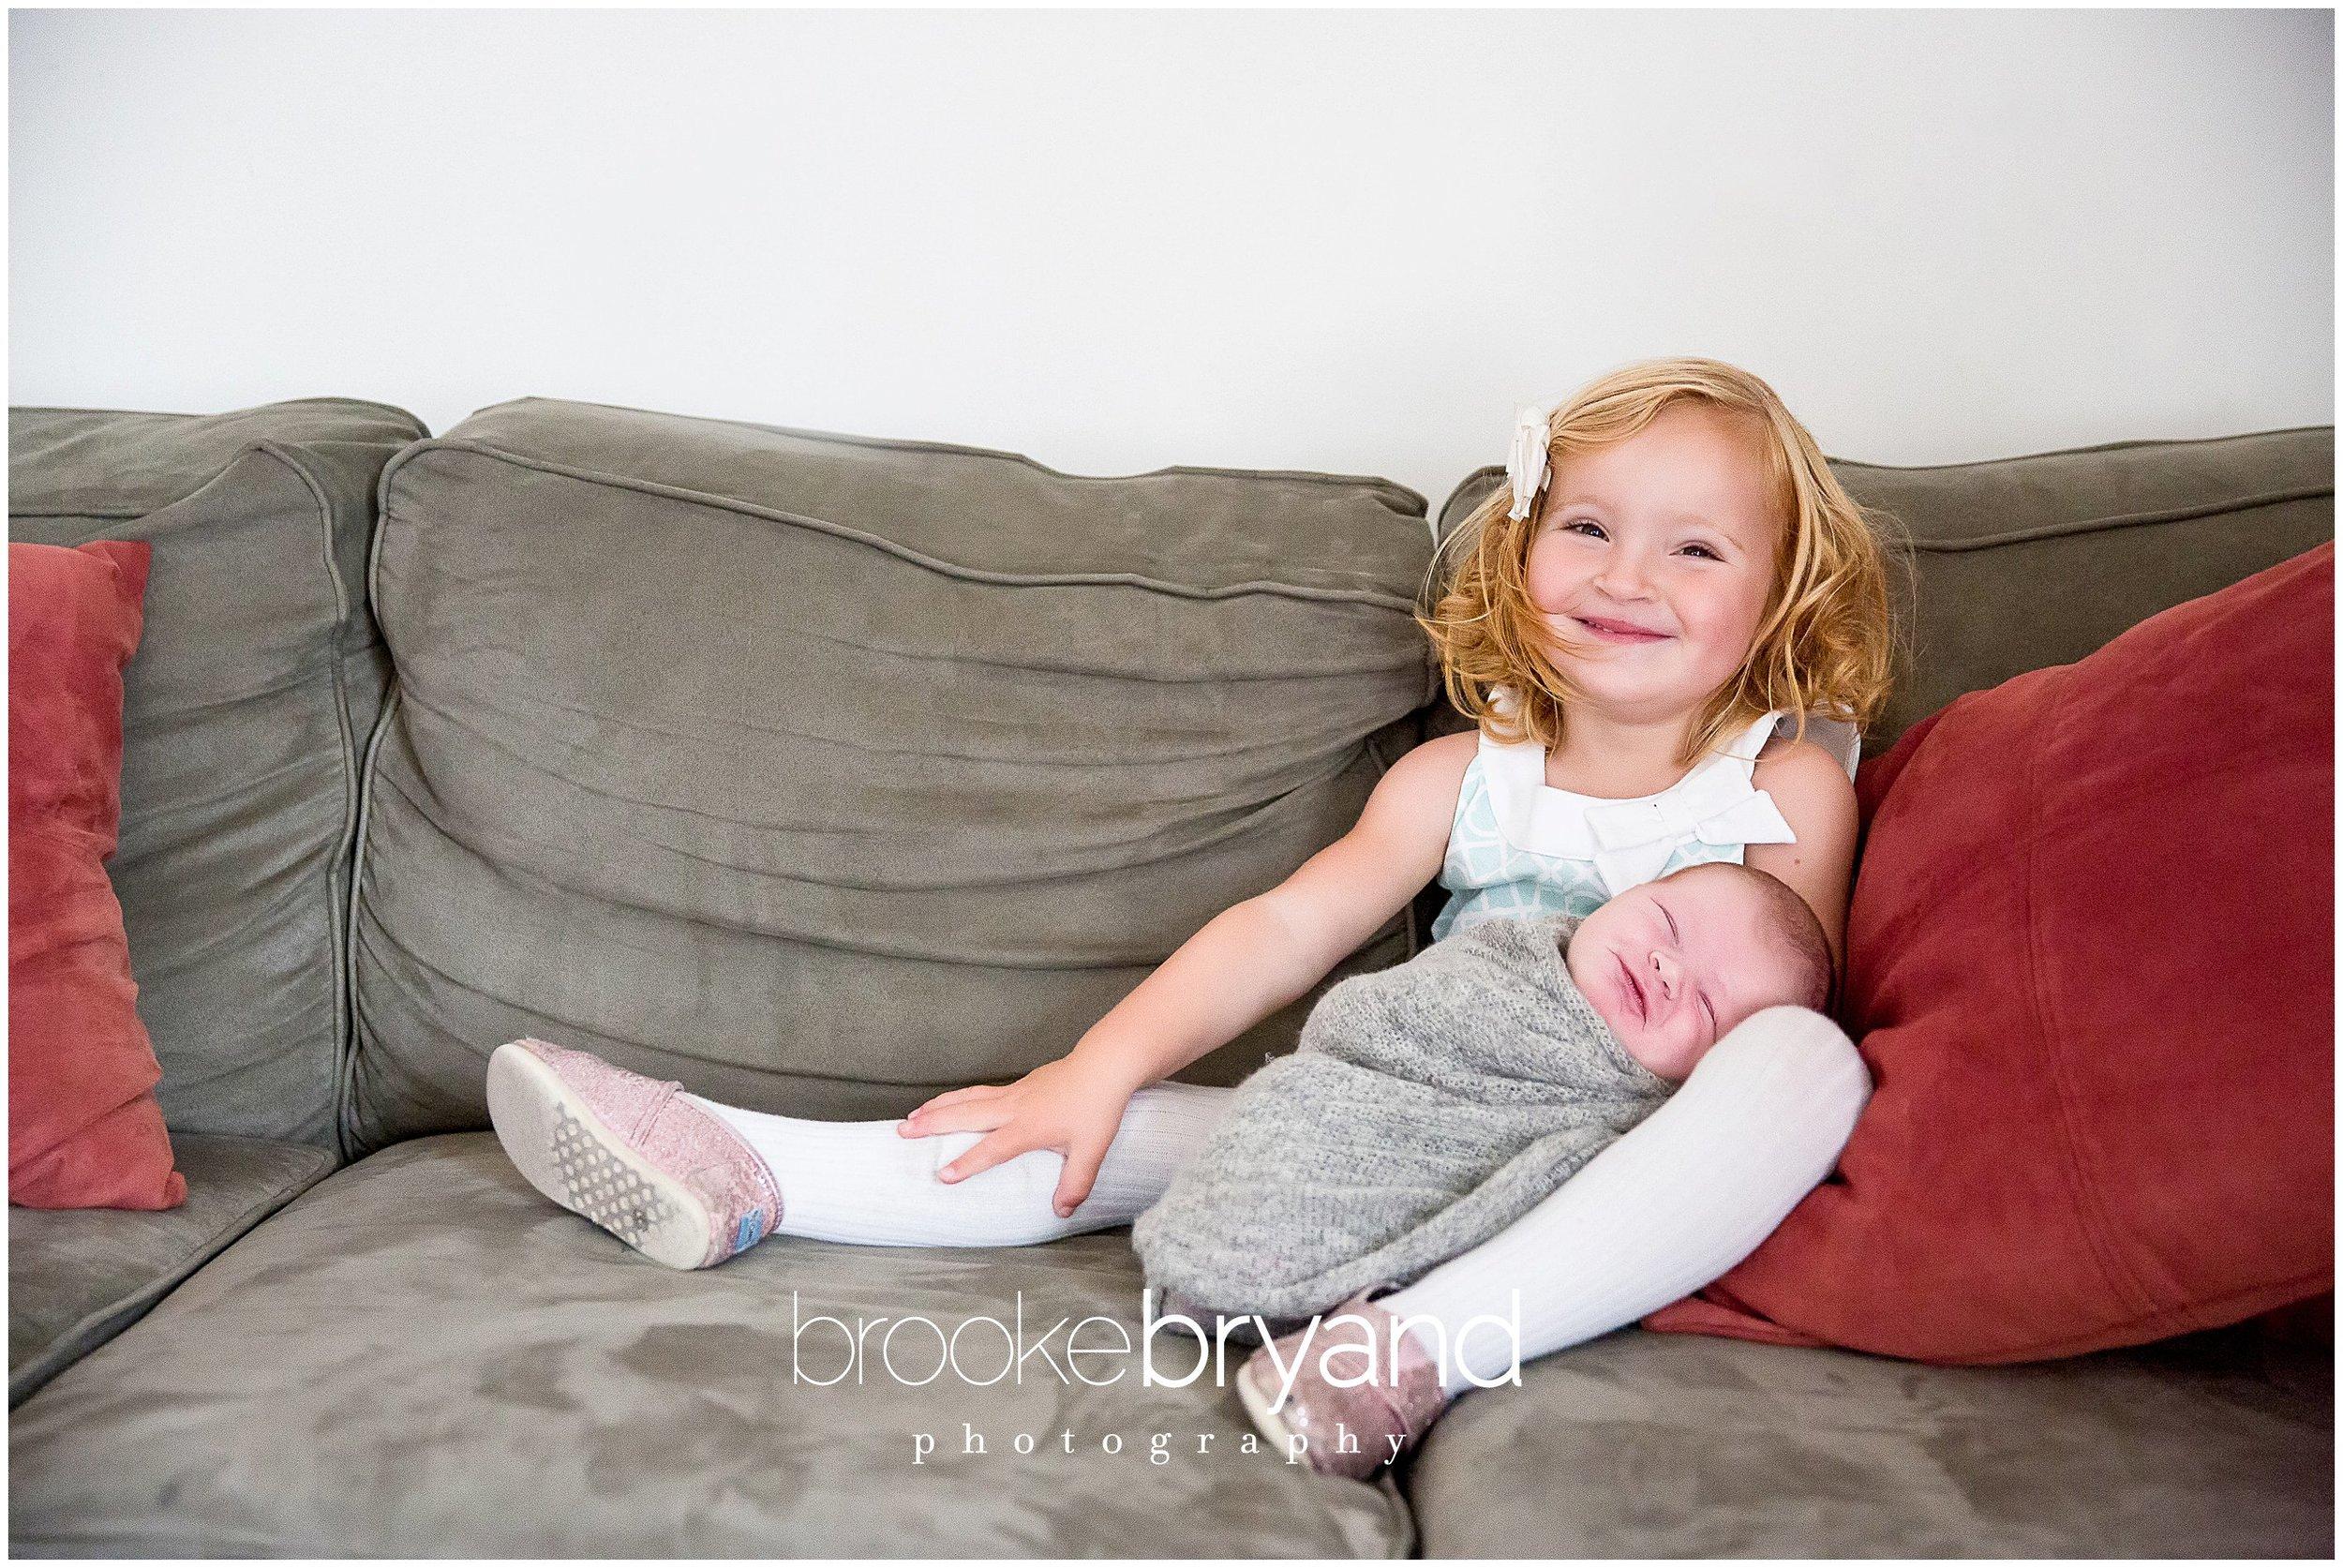 08.2014-Devlin-BBP_3887_retouch1_San-Francisco-Family-Photos-Brooke-Bryand-Photography.jpg